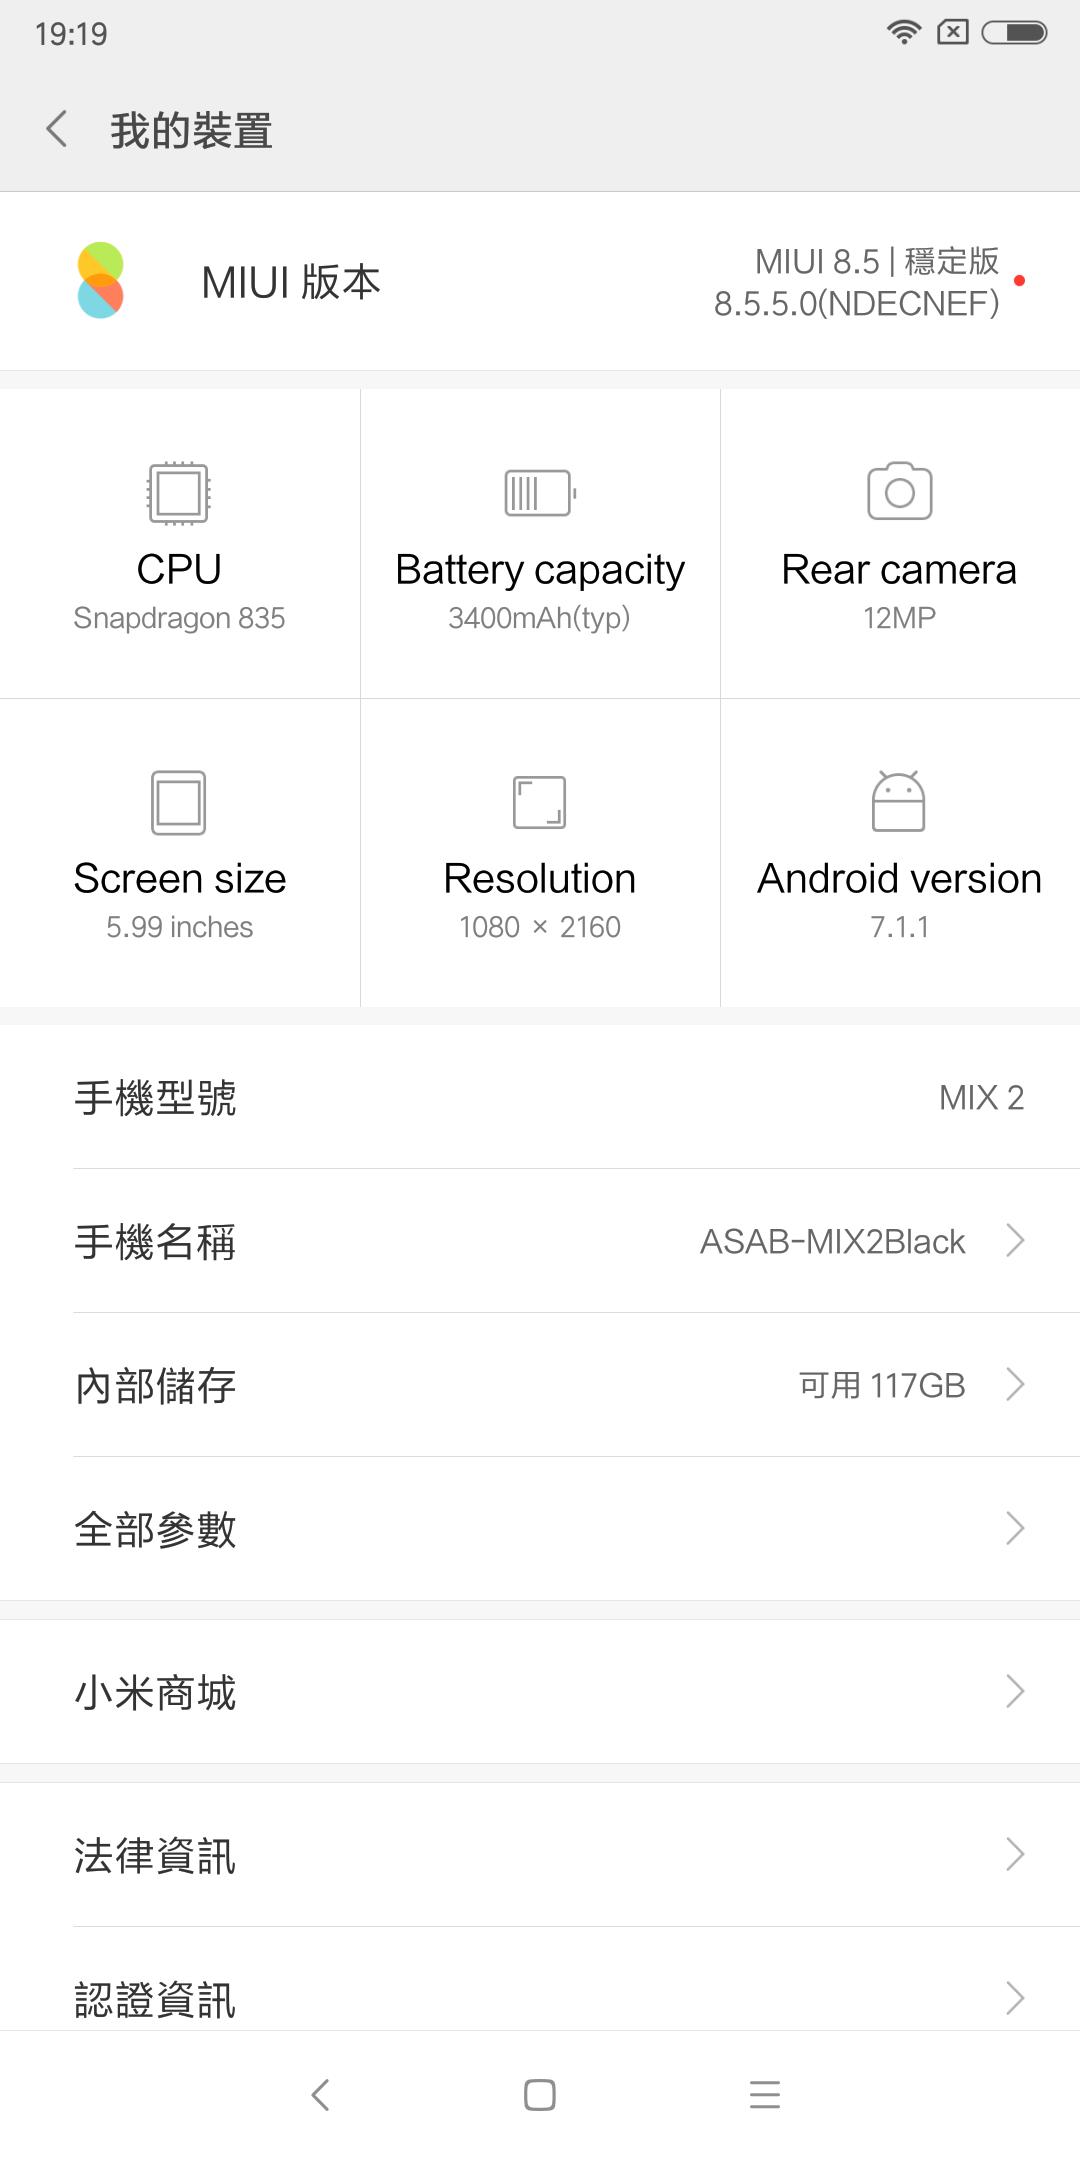 Screenshot_2018-04-11-19-19-30-470_com.android.settings